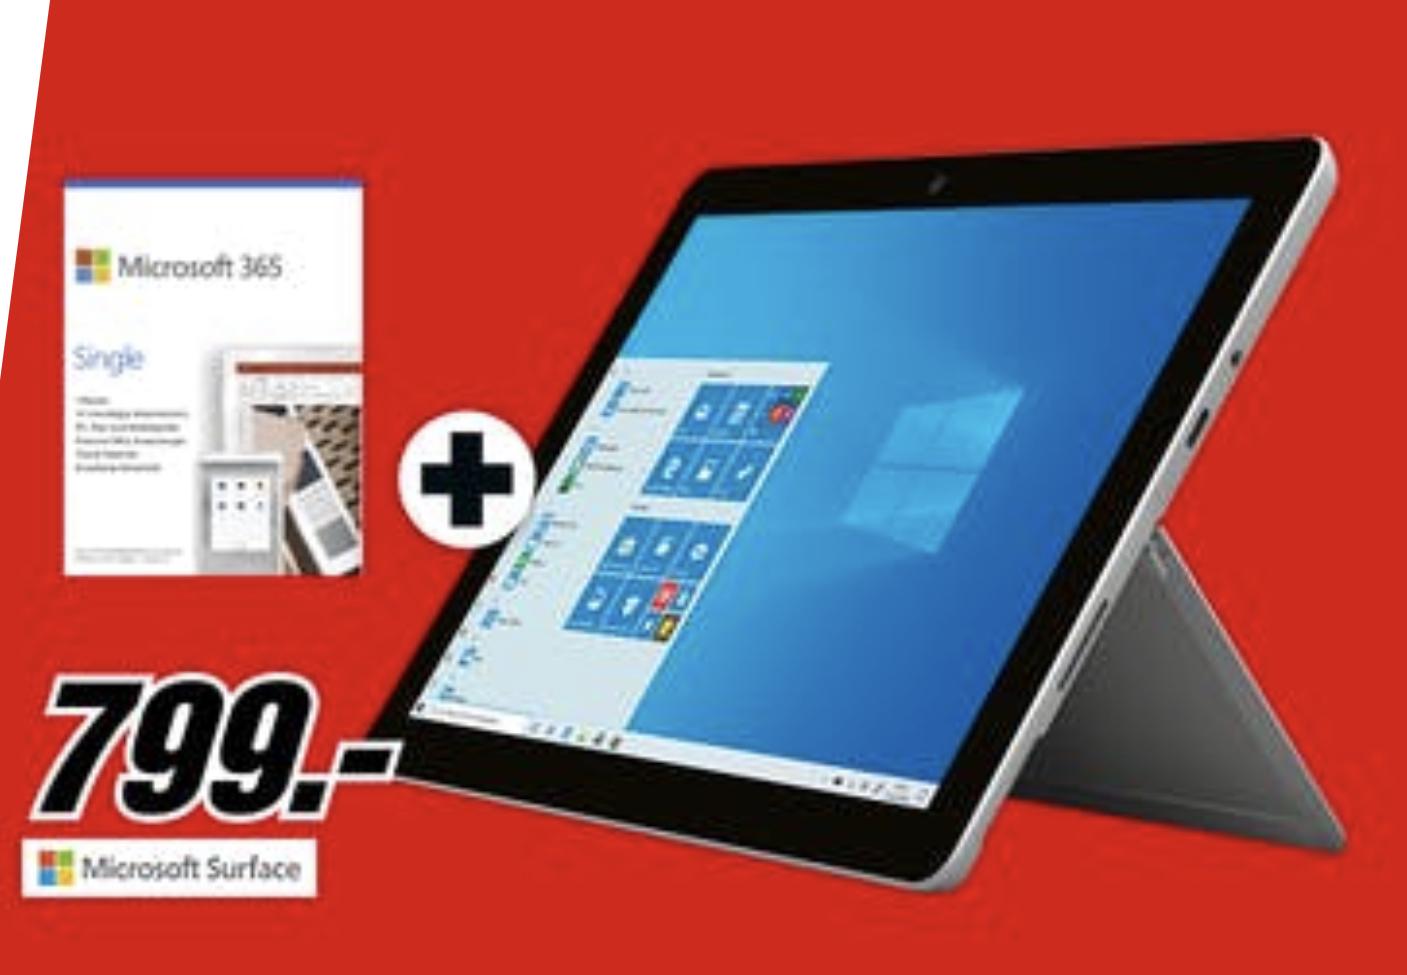 MICROSOFT Surface Pro 7 12,3 Zoll Core i5 8GB 128GB SSD Platinum + Microsoft 365 Single für 789€ / Amazon 799€